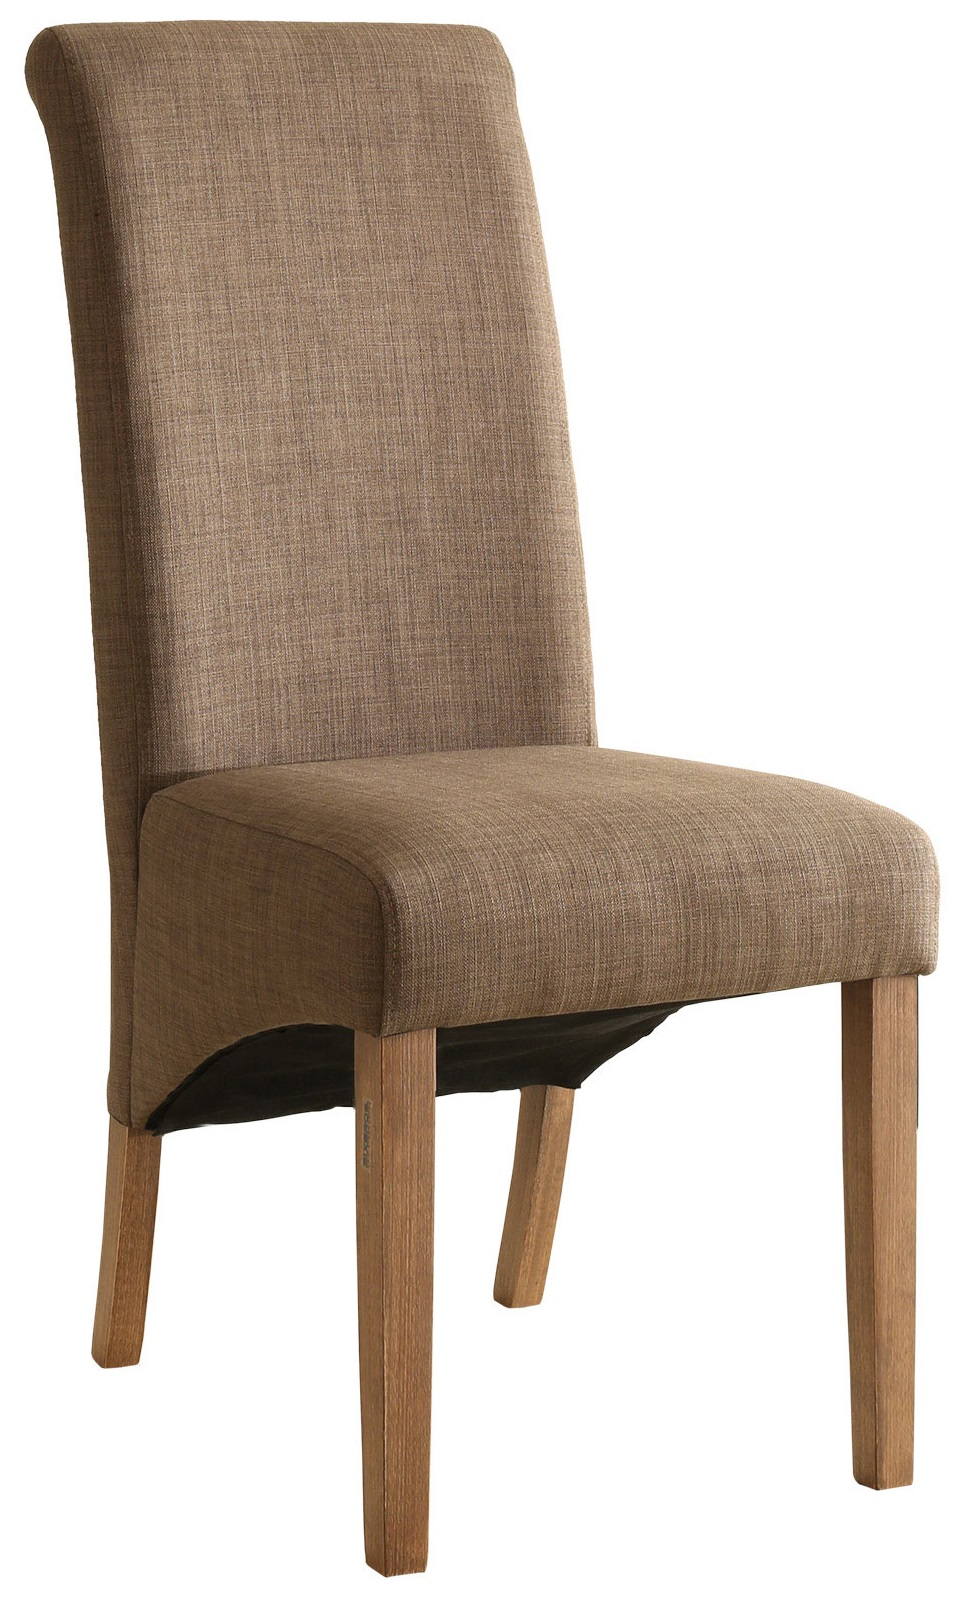 Sixbros silla de comedor silla tapizada haya tela varios for Sillas comedor tapizadas tela